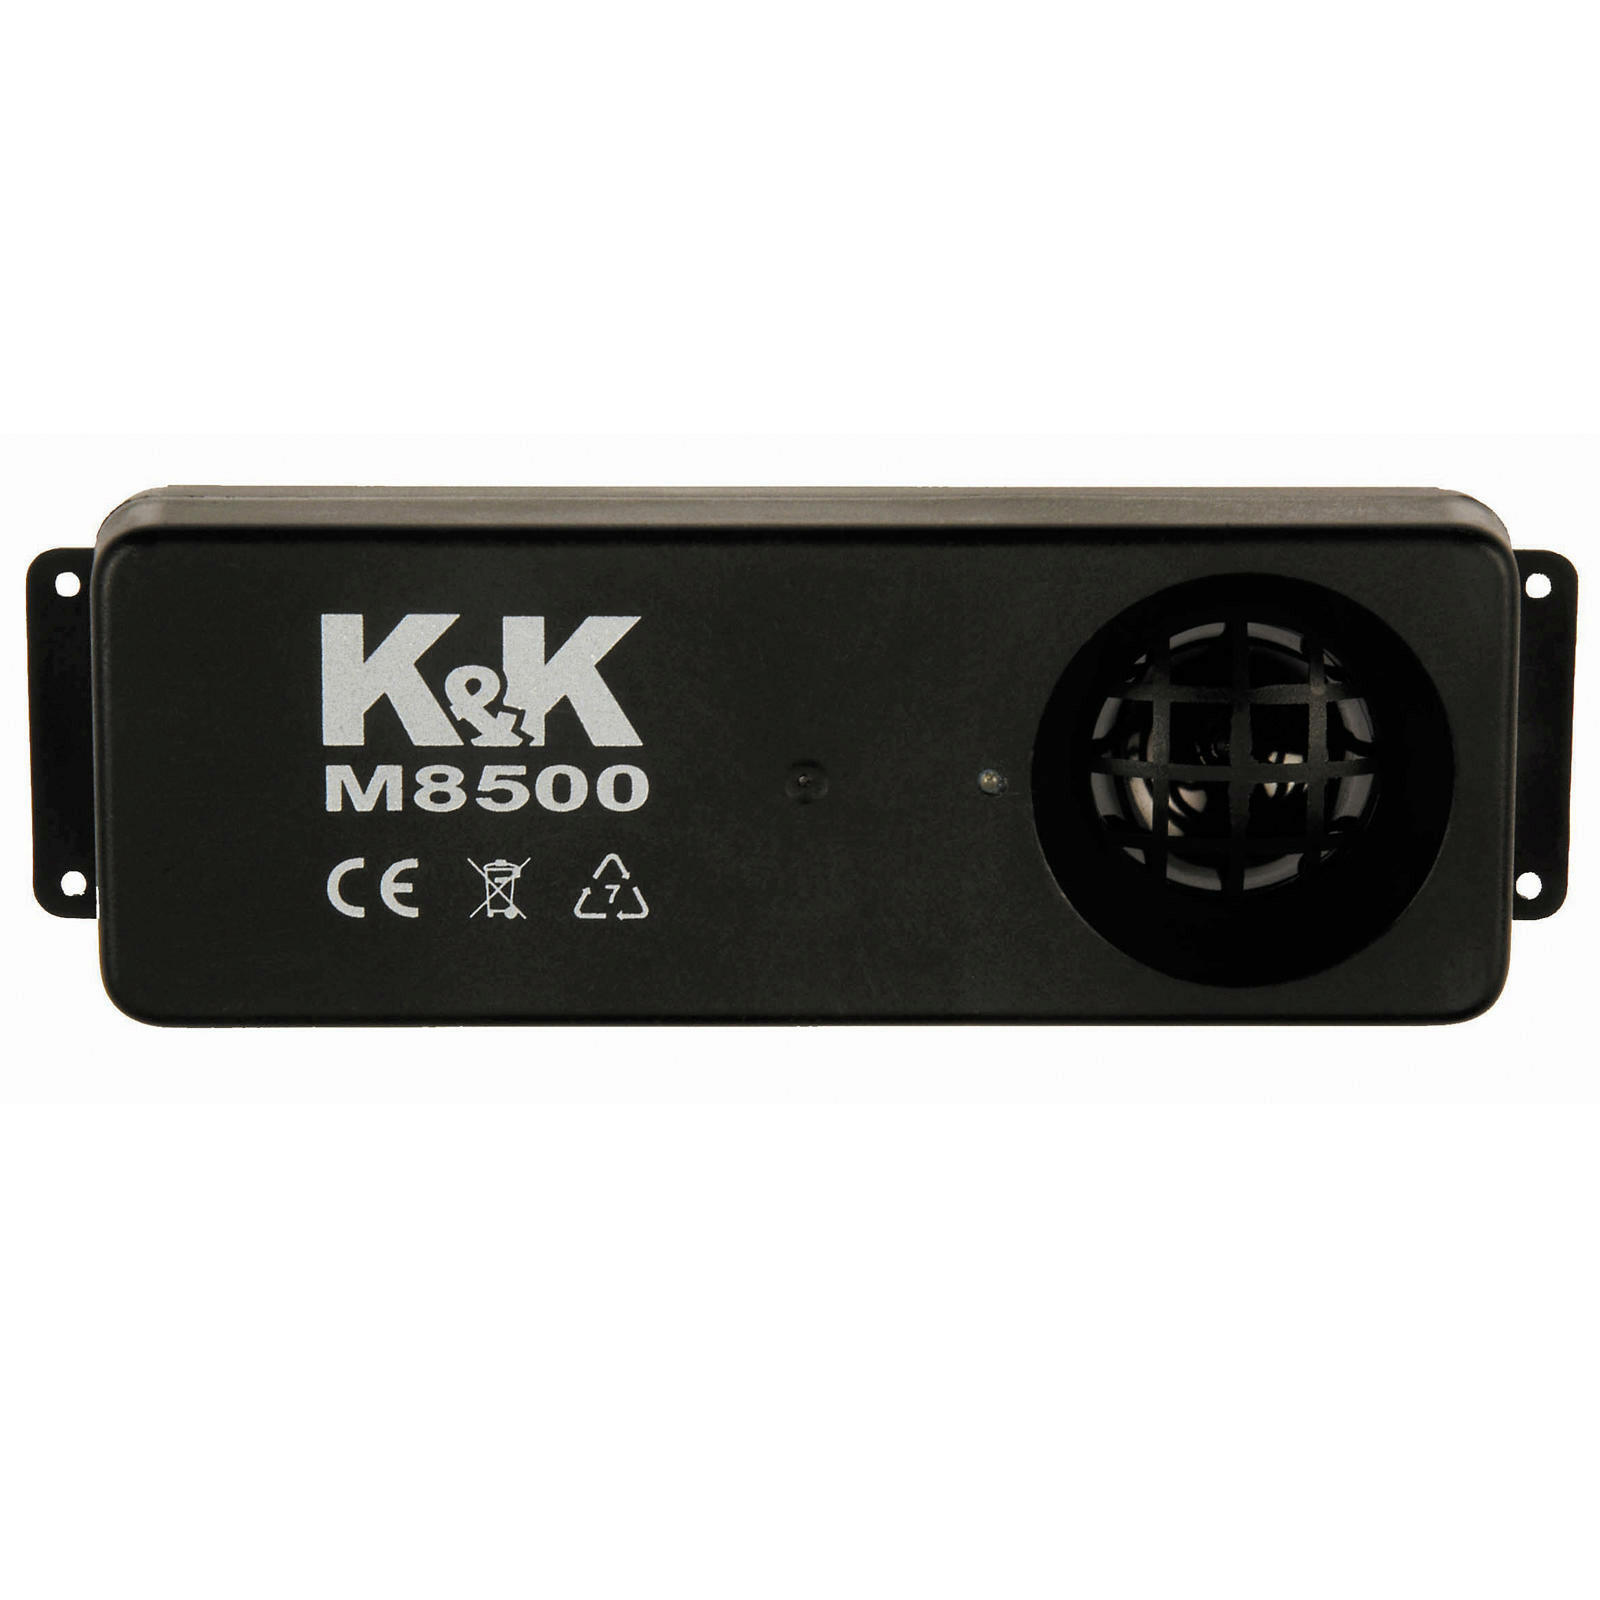 K&K Marderabwehrgerät M8500